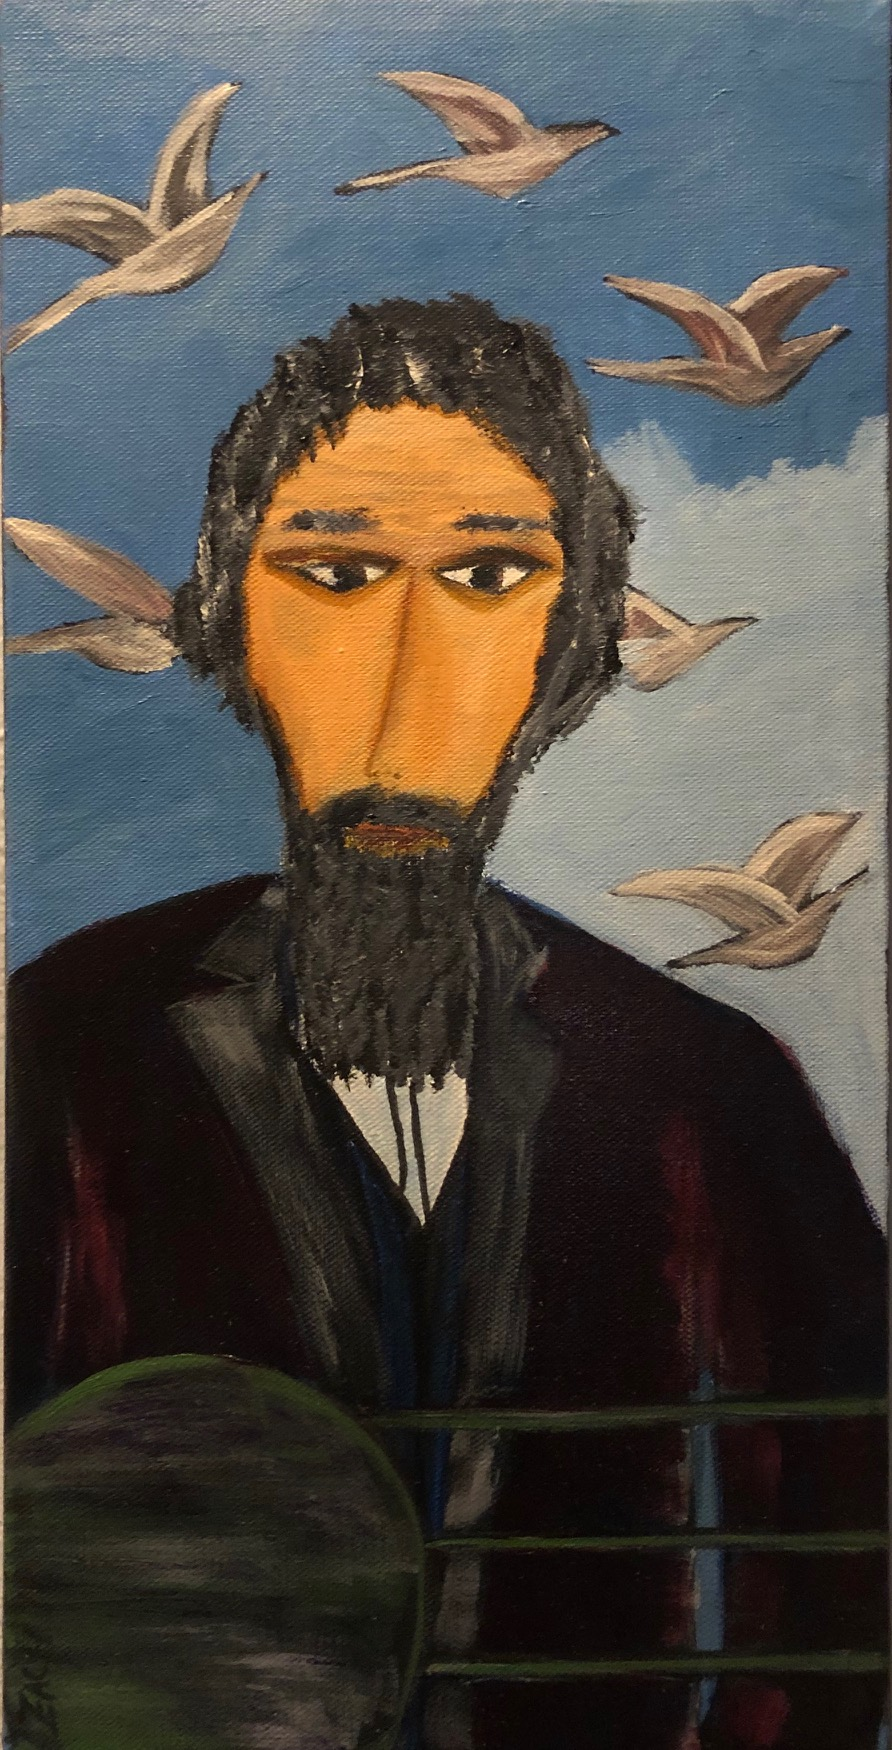 Man with Birds